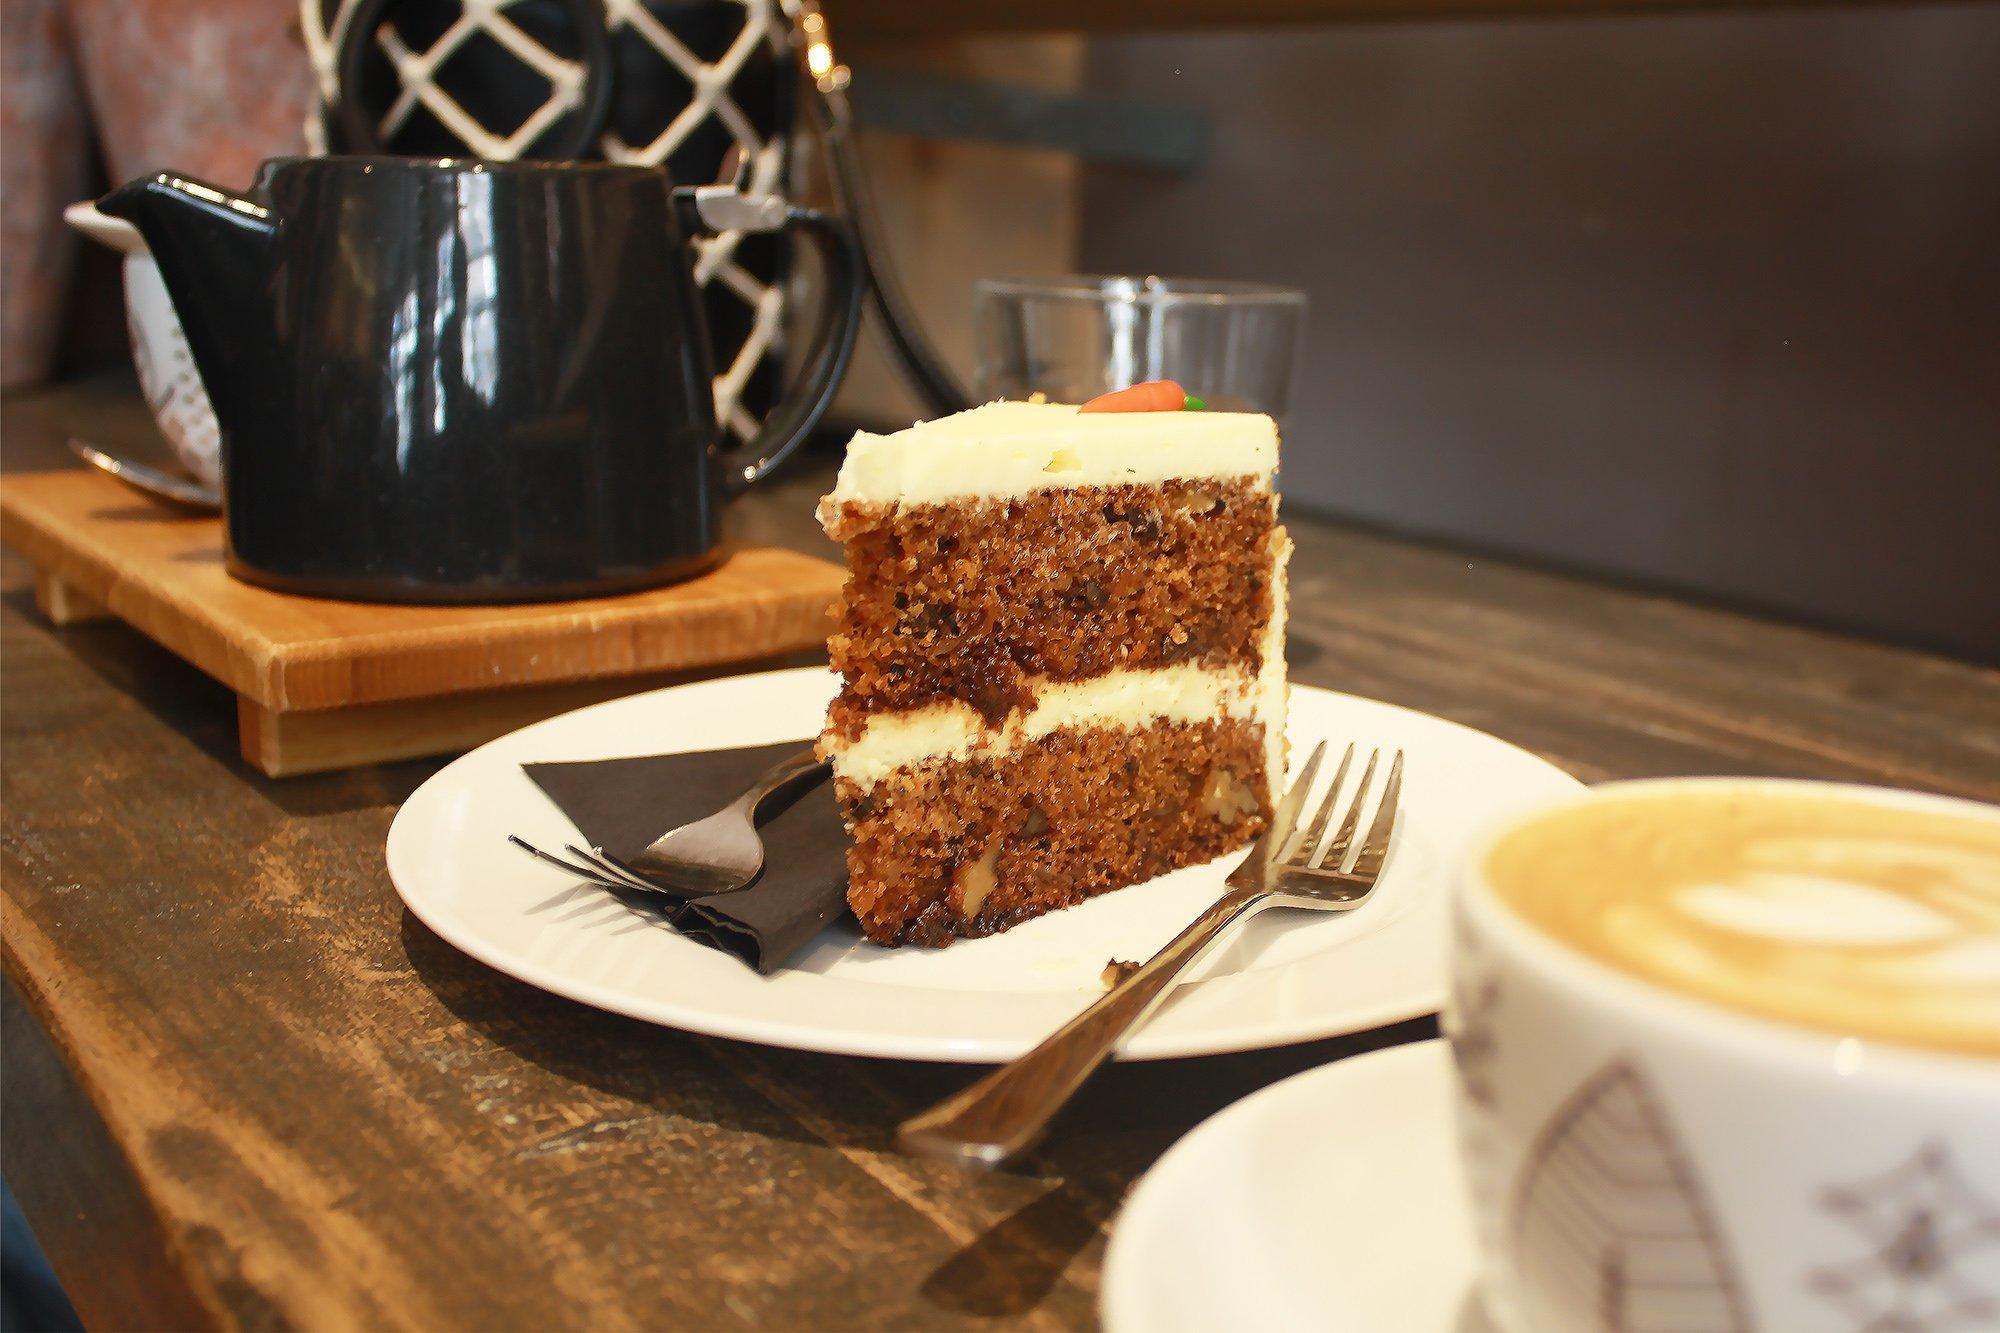 Carrot cake, tea and latte at La Boheme Cafe